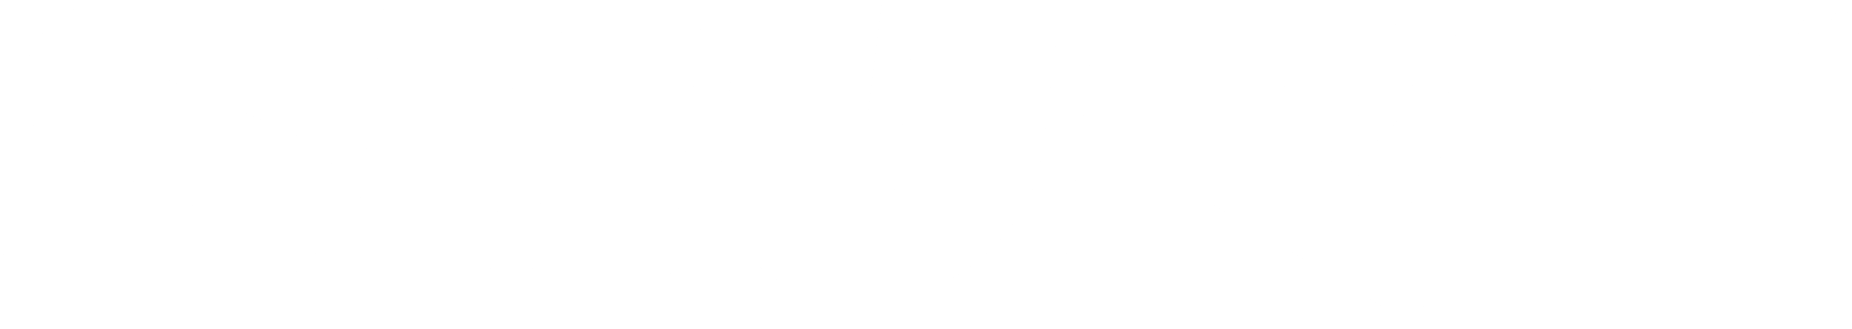 Shure logo white